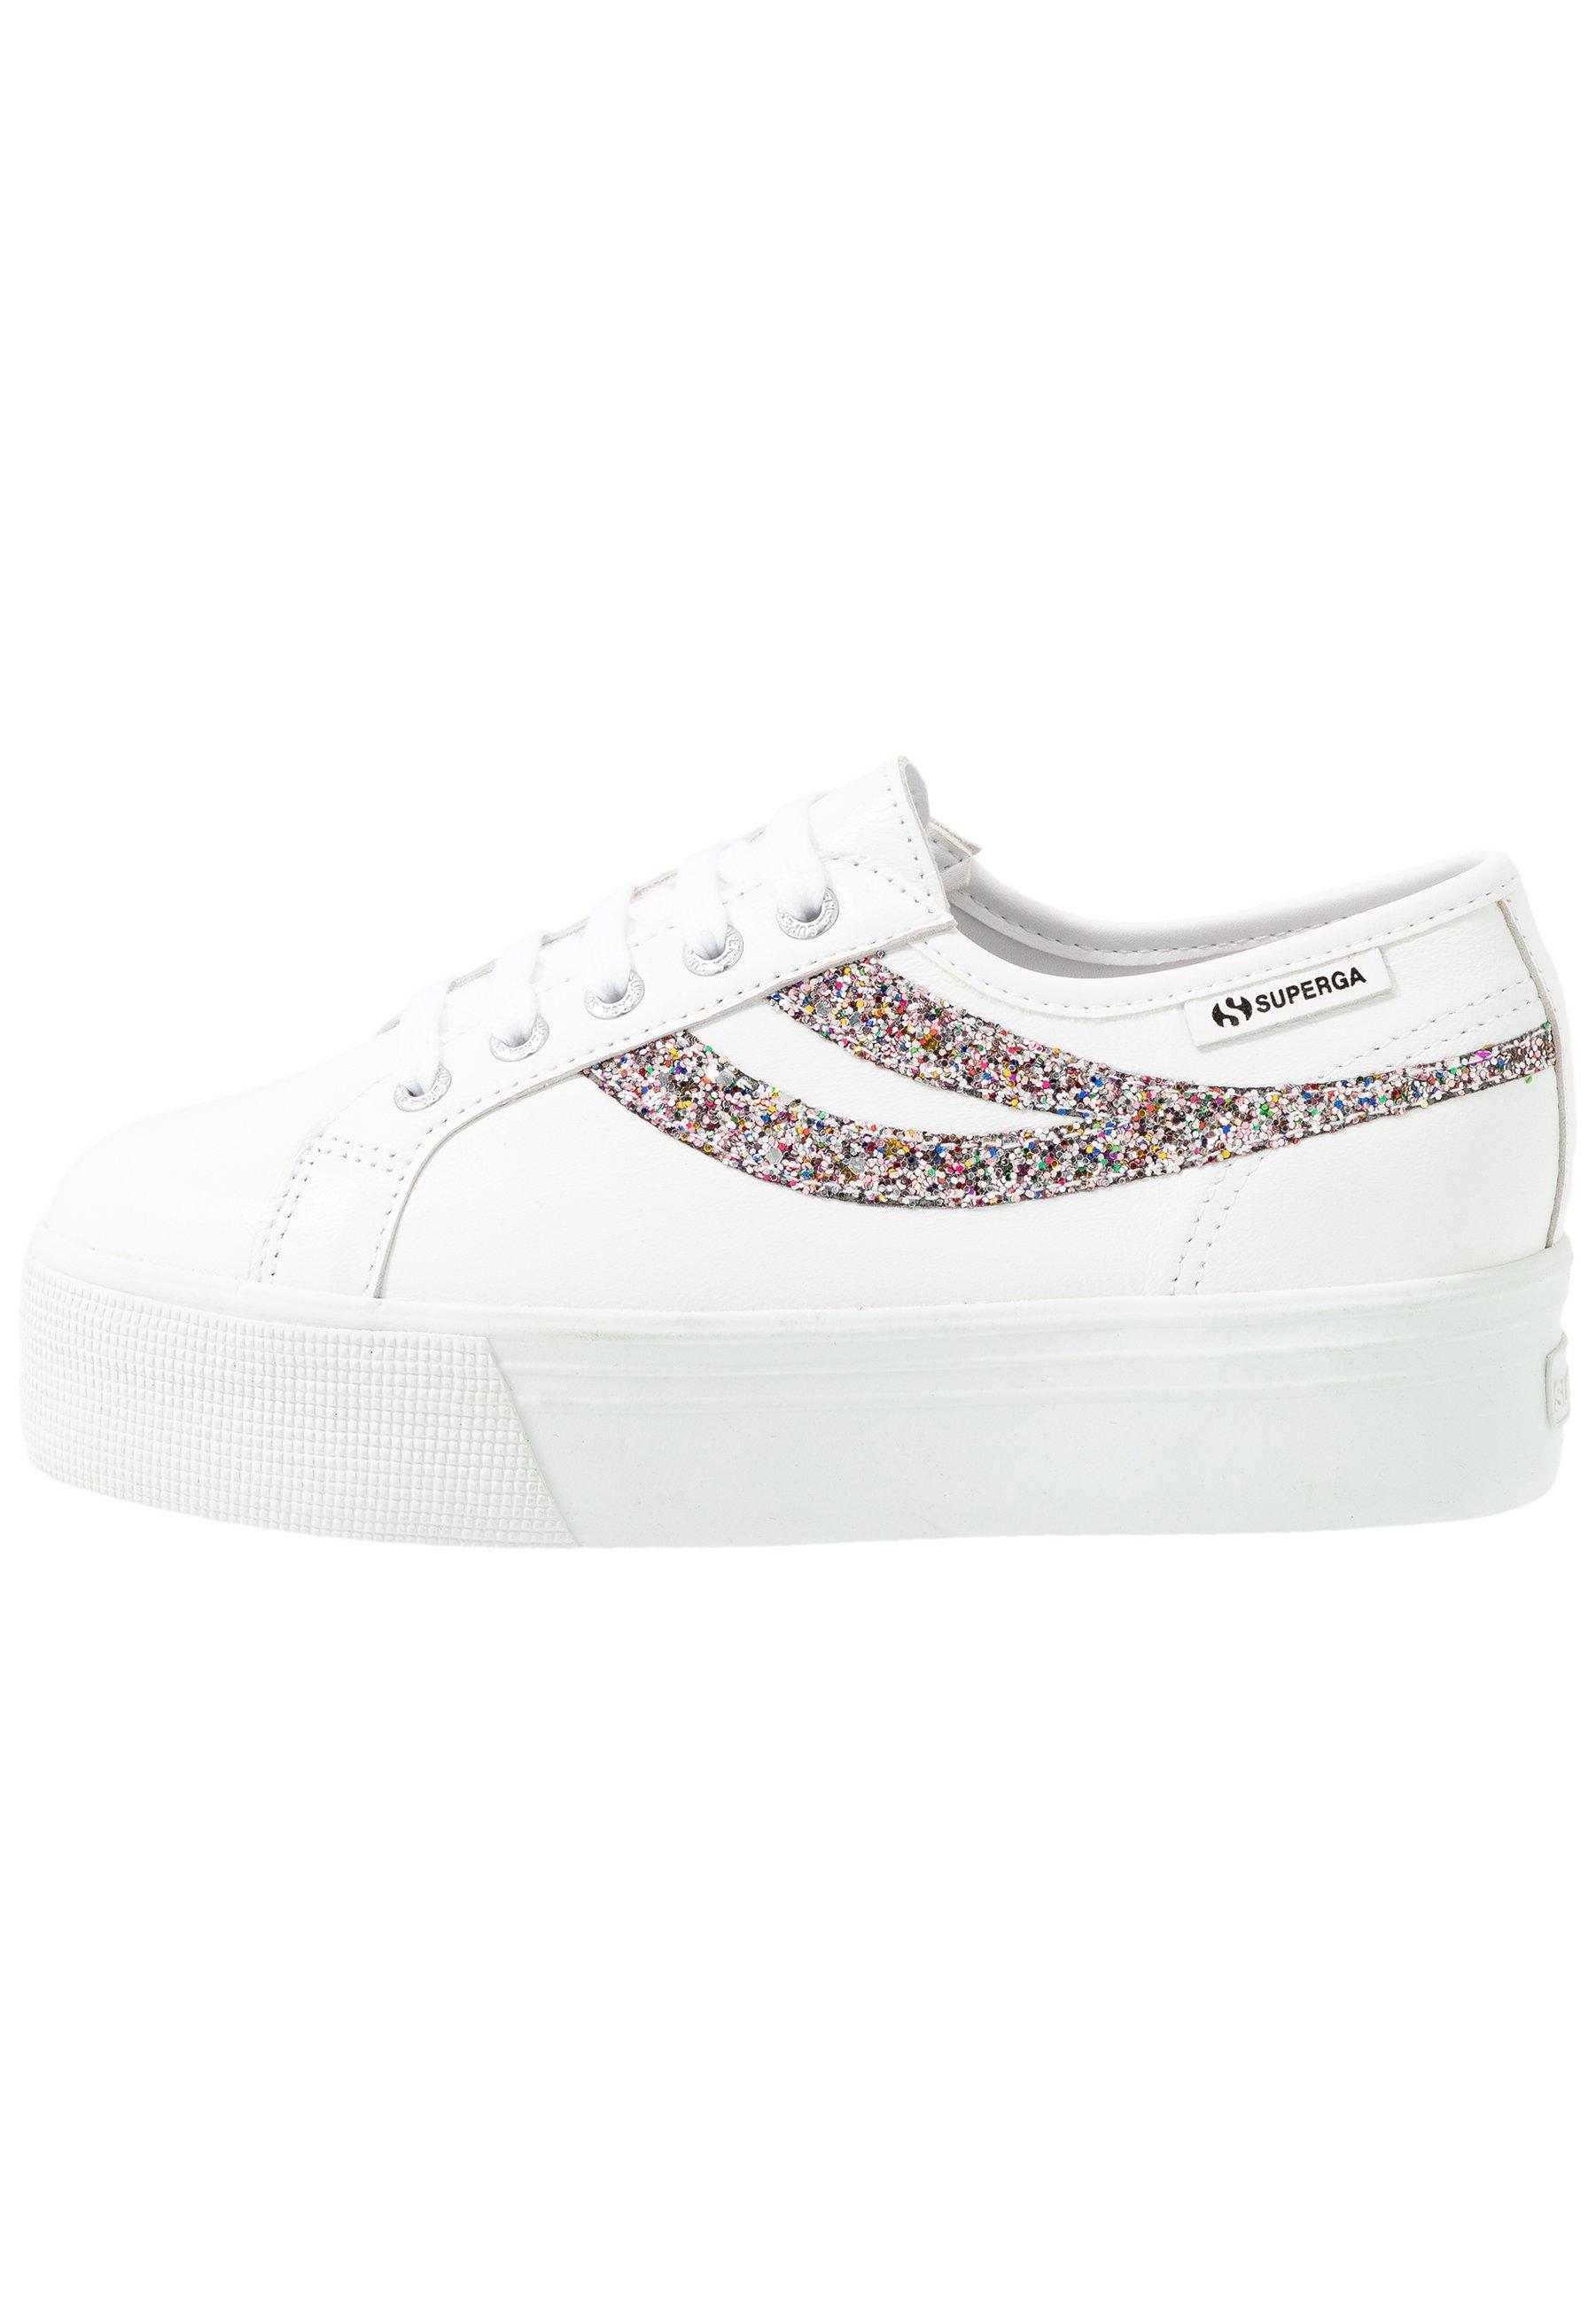 2790 Sneakers whitesilvermulticolor